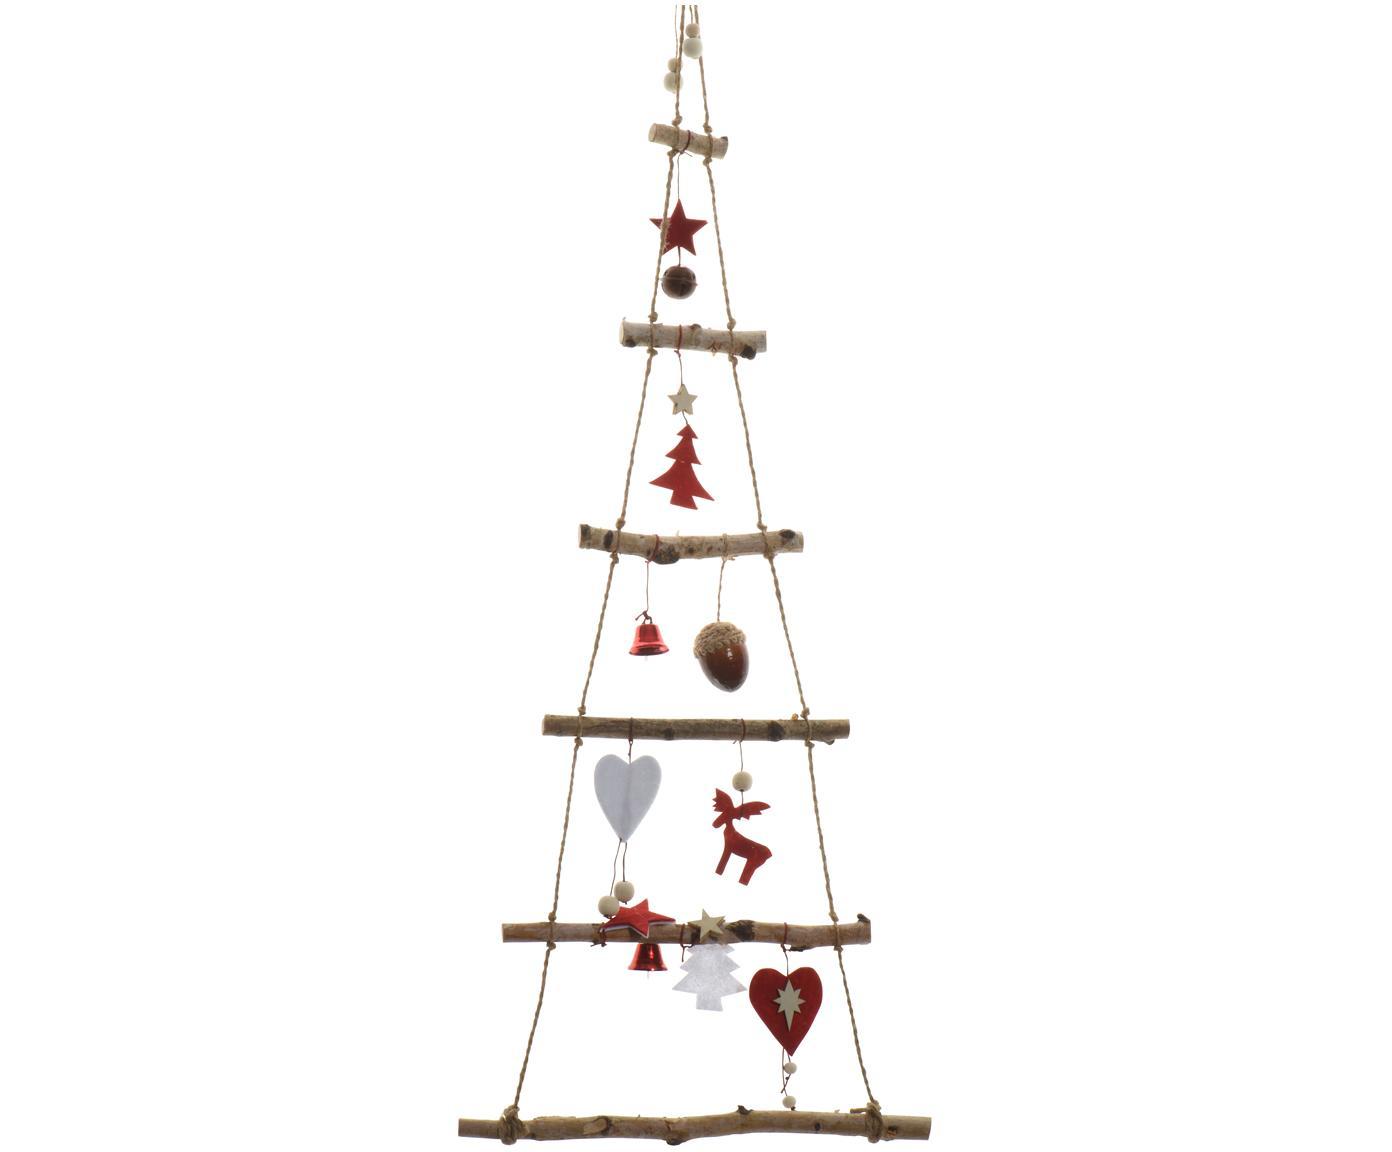 Wand-Objekt Rinde, Birkenholz, Birkenholz, Rot, 34 x 100 cm